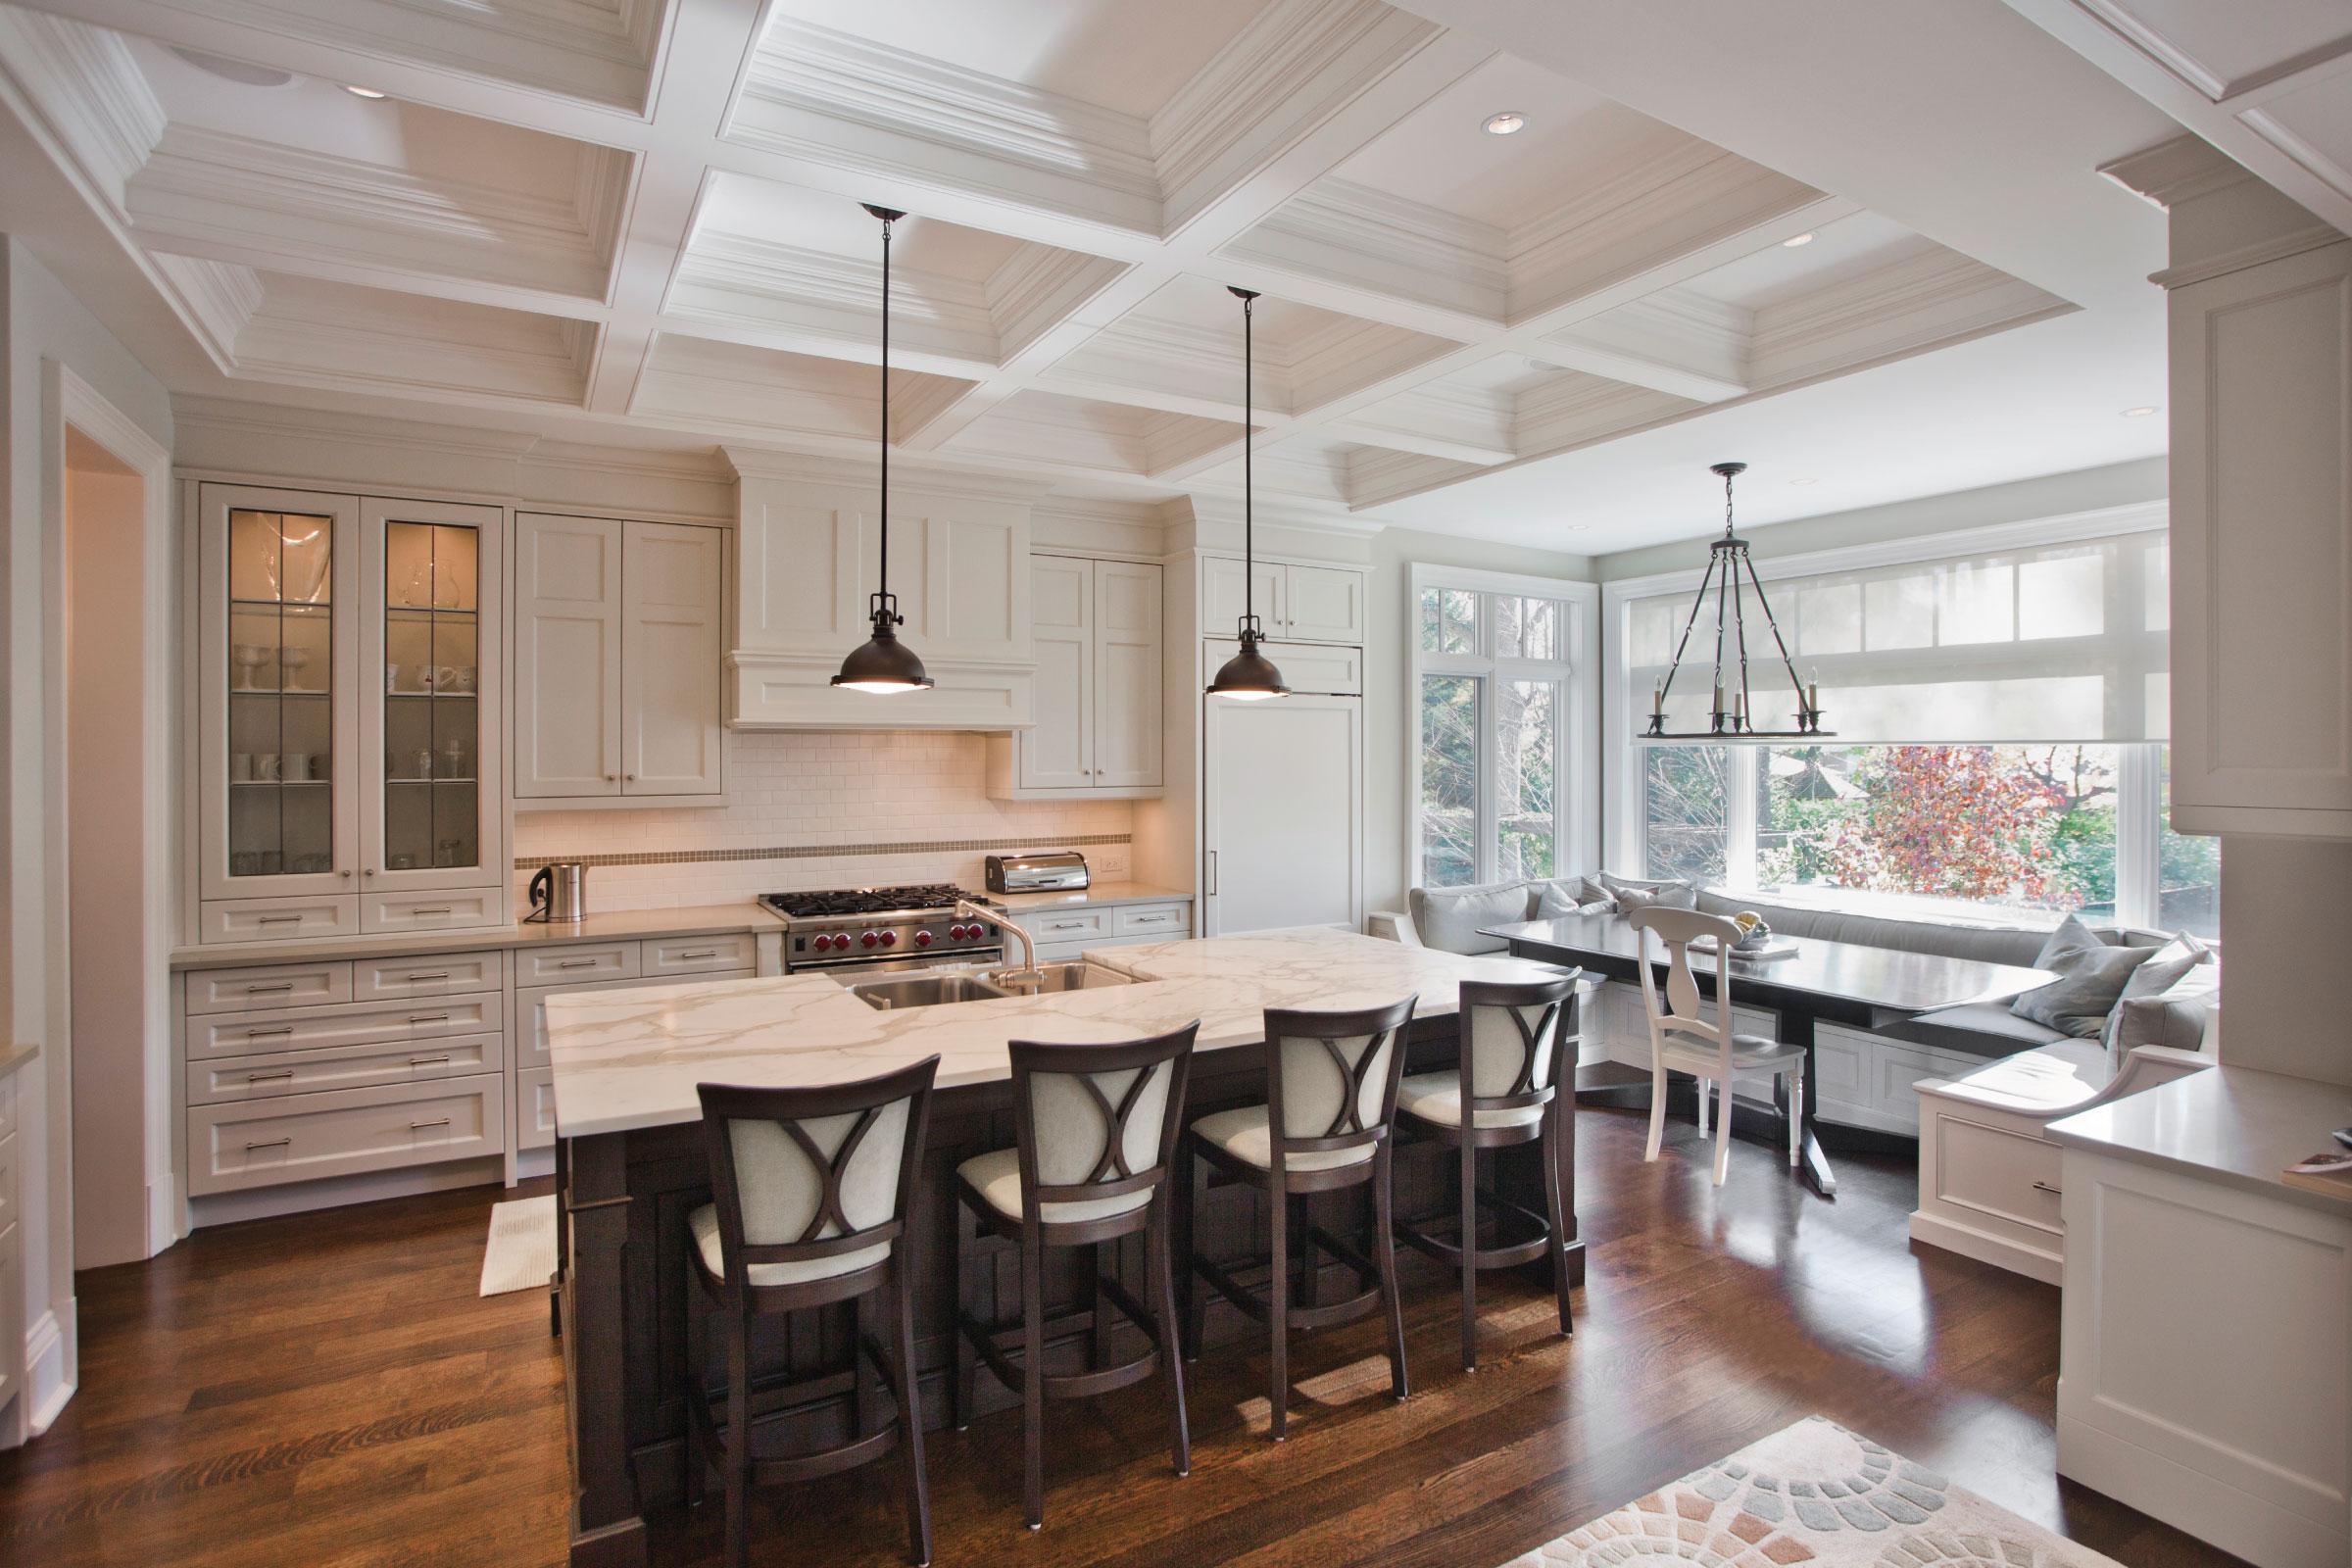 S K R Homes Custom Home Builder Toronto Tom Spragge Architects